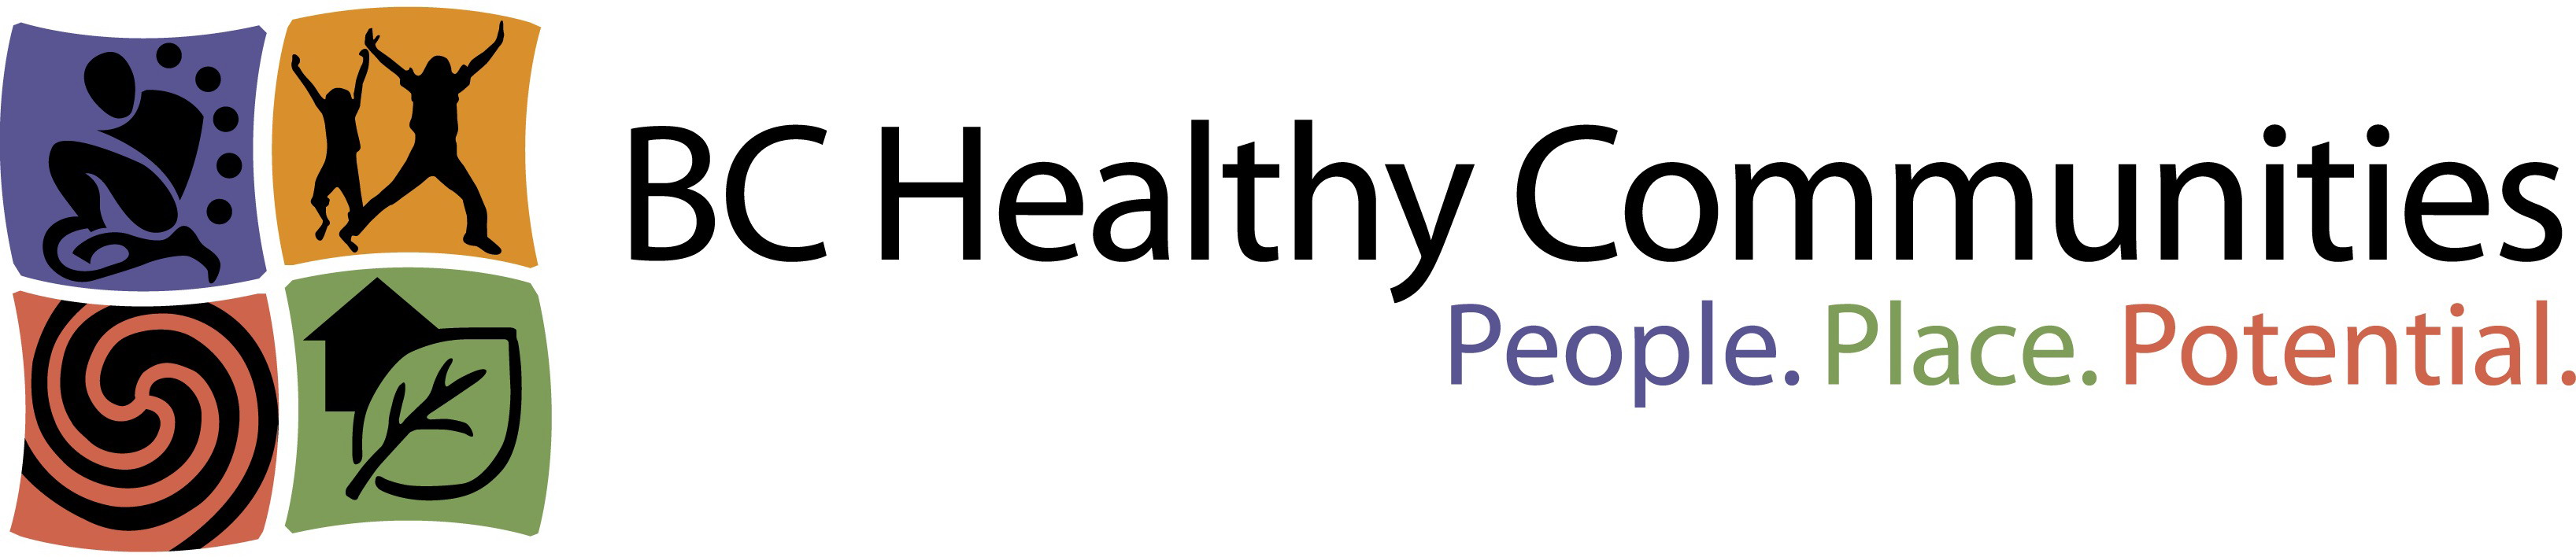 BCHC-colour-logo.jpg